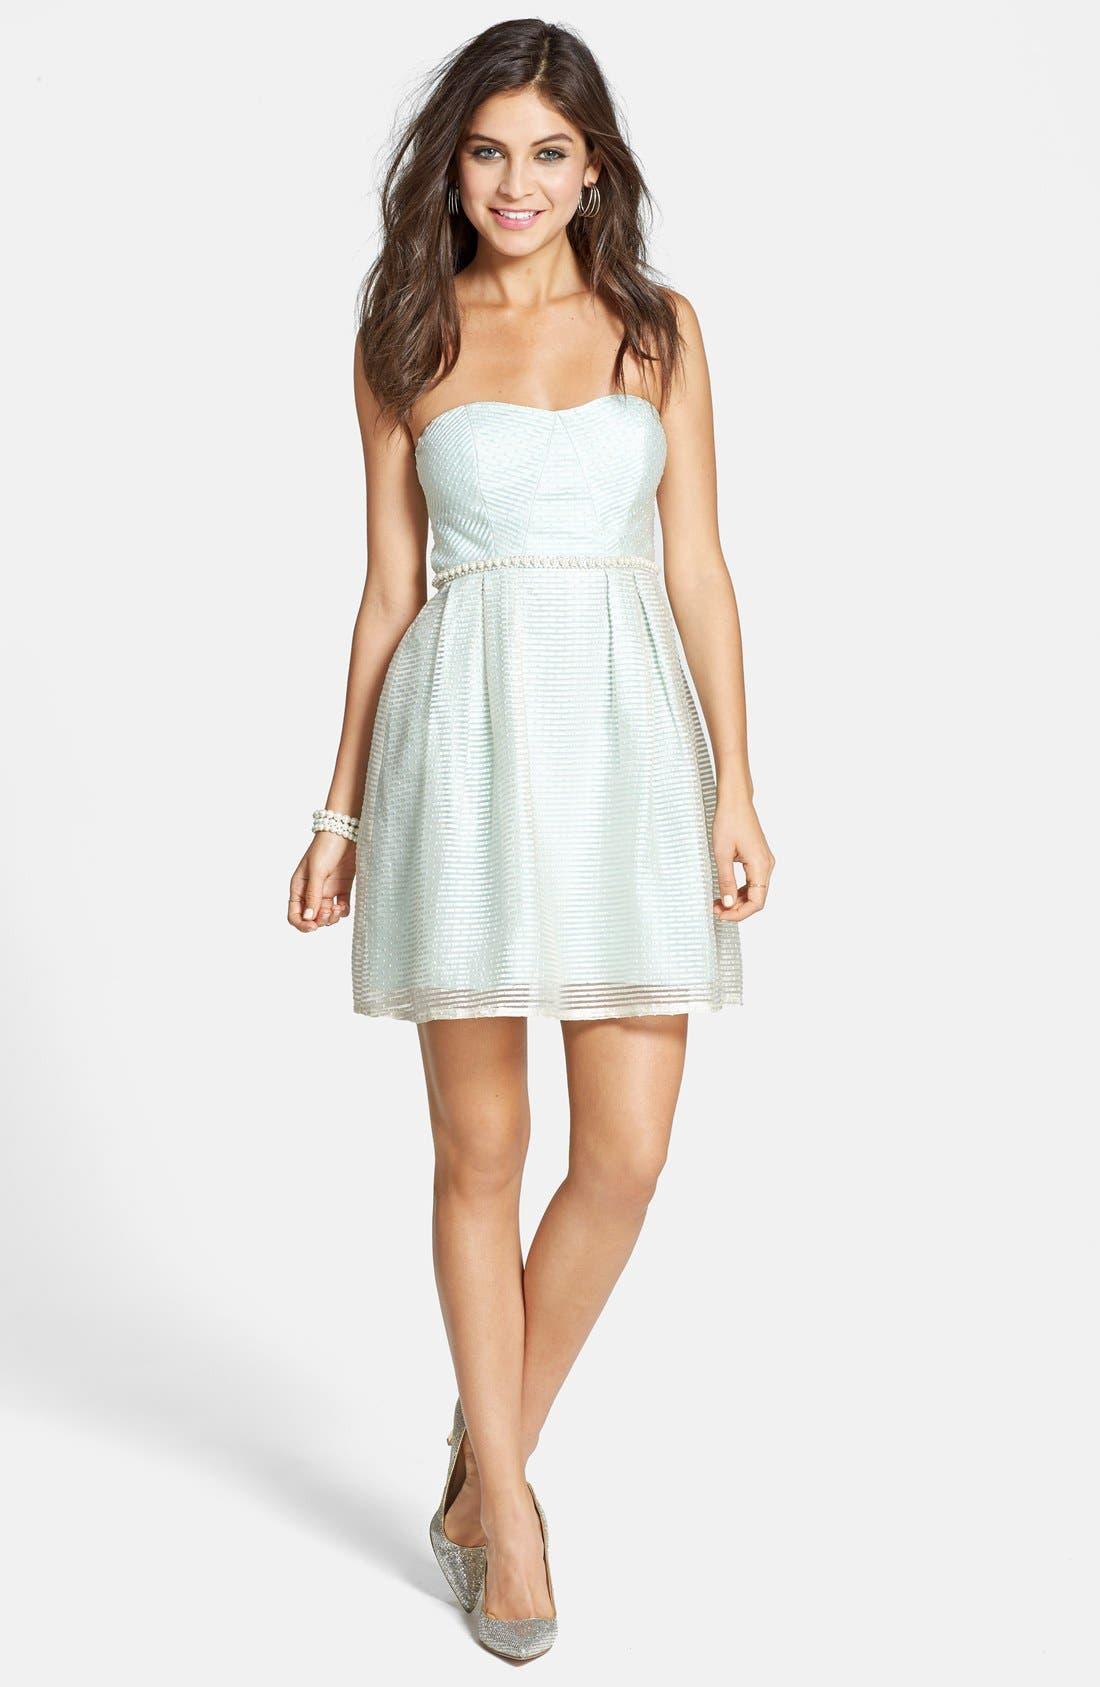 Alternate Image 1 Selected - a. drea Strapless Seersucker Fit & Flare Dress (Juniors)